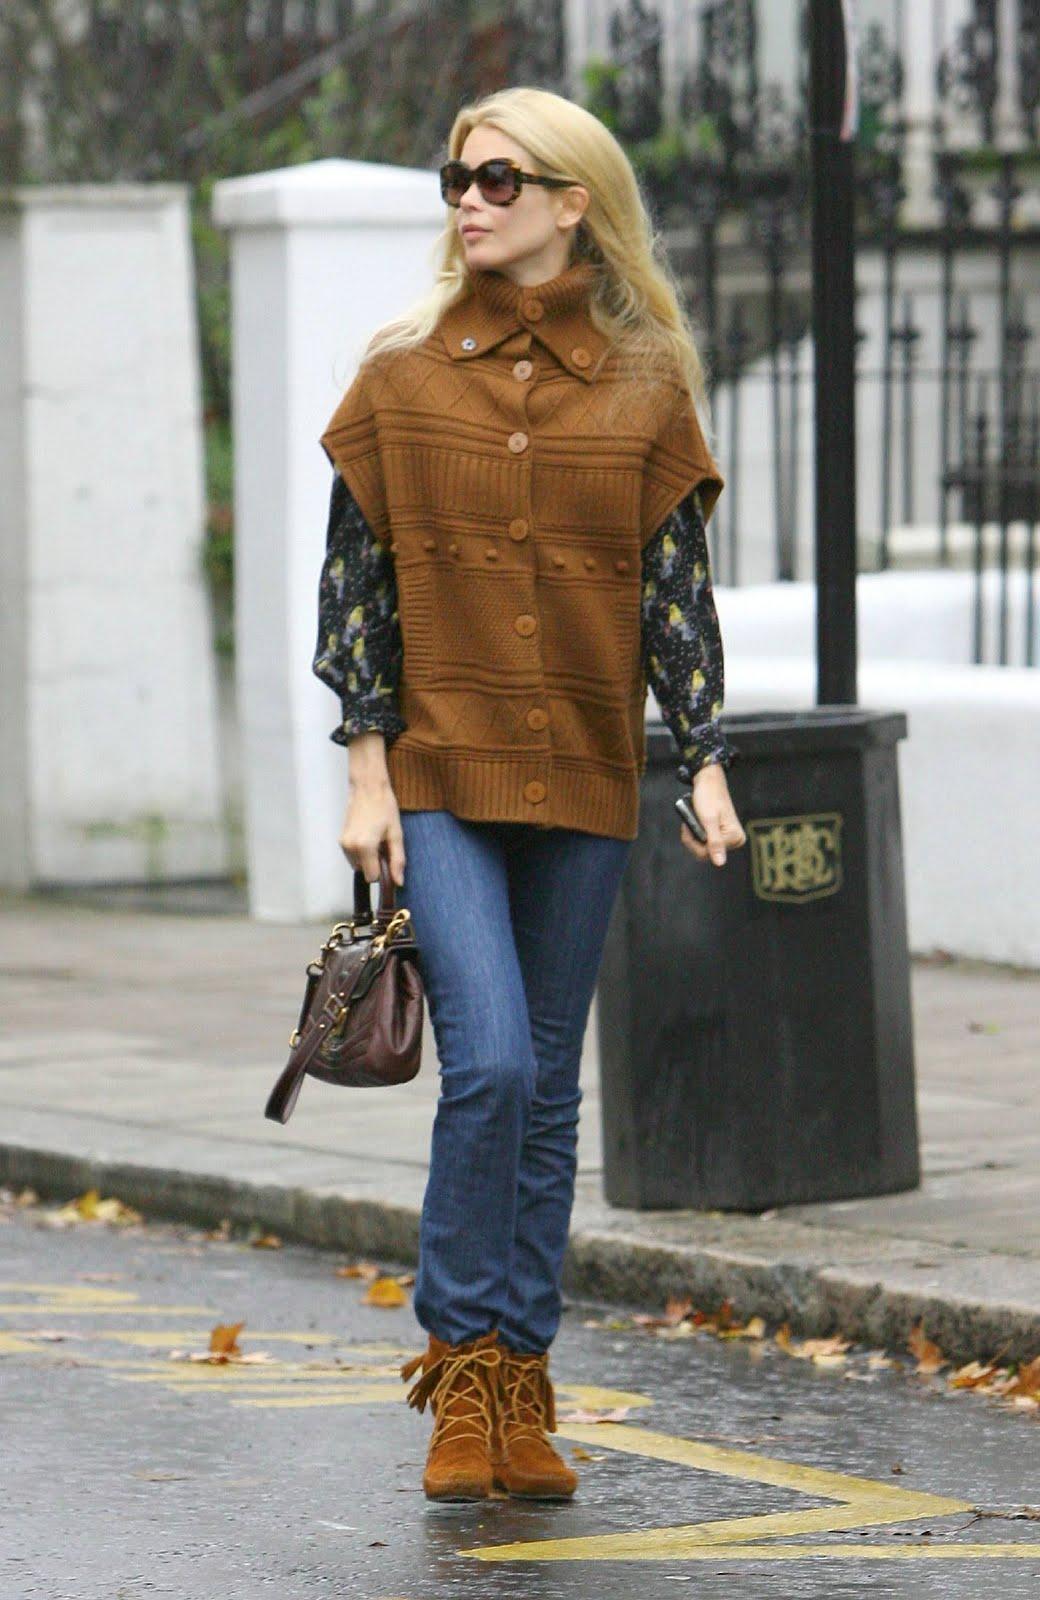 http://4.bp.blogspot.com/_pB39VNVB0Wk/S8n5VkuiXaI/AAAAAAAADXY/vuQBkzQwCFo/s1600/34822_Celebutopia-Claudia_Schiffer_in_London-05_122_563lo.jpg